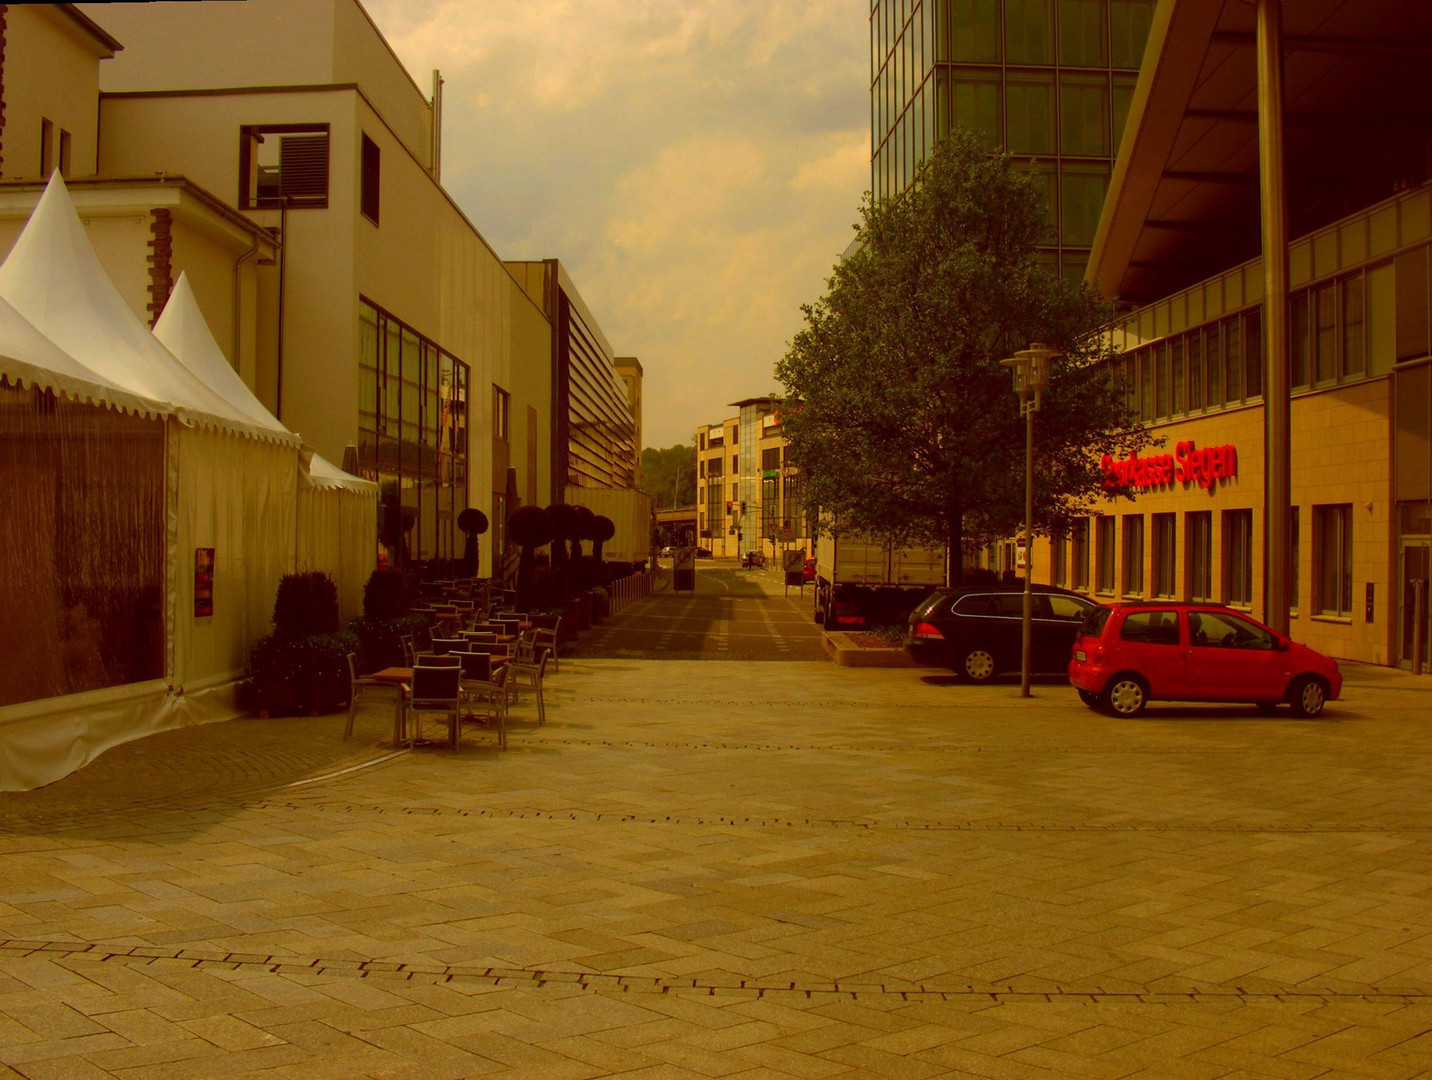 Morleystrasse